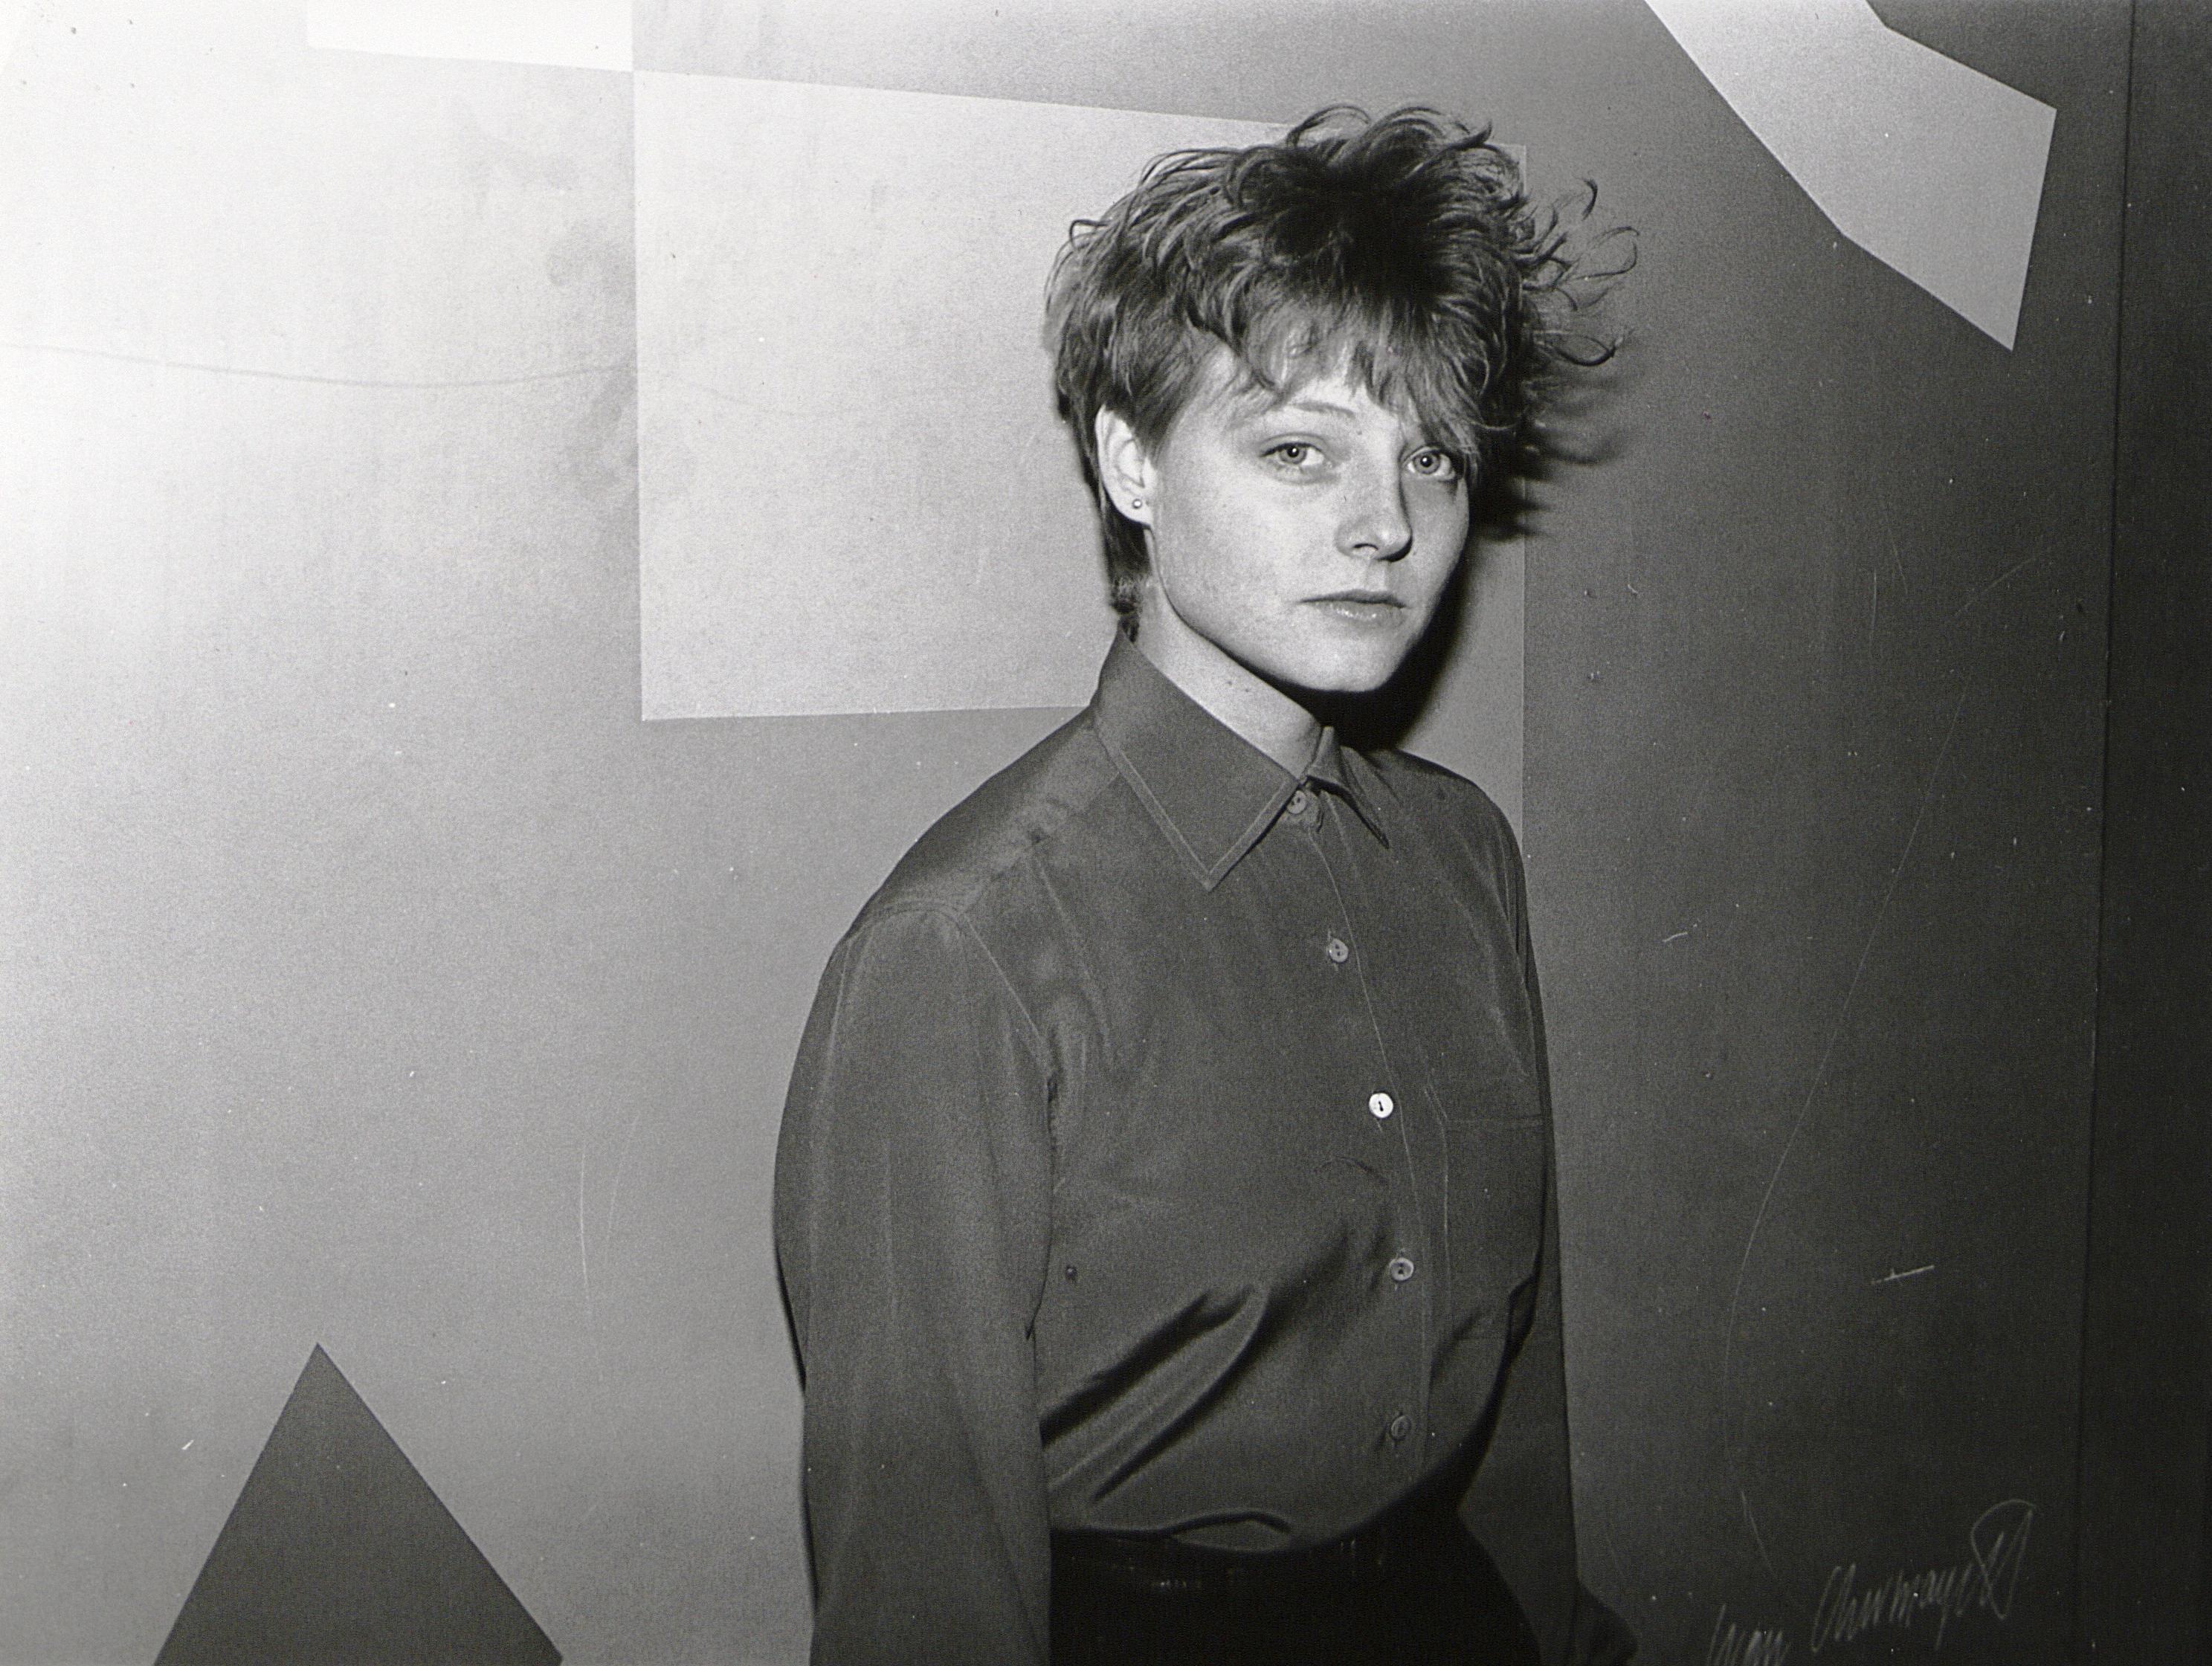 Jodie Foster Yale Undergrad 1984 The Fosters Jodie Foster